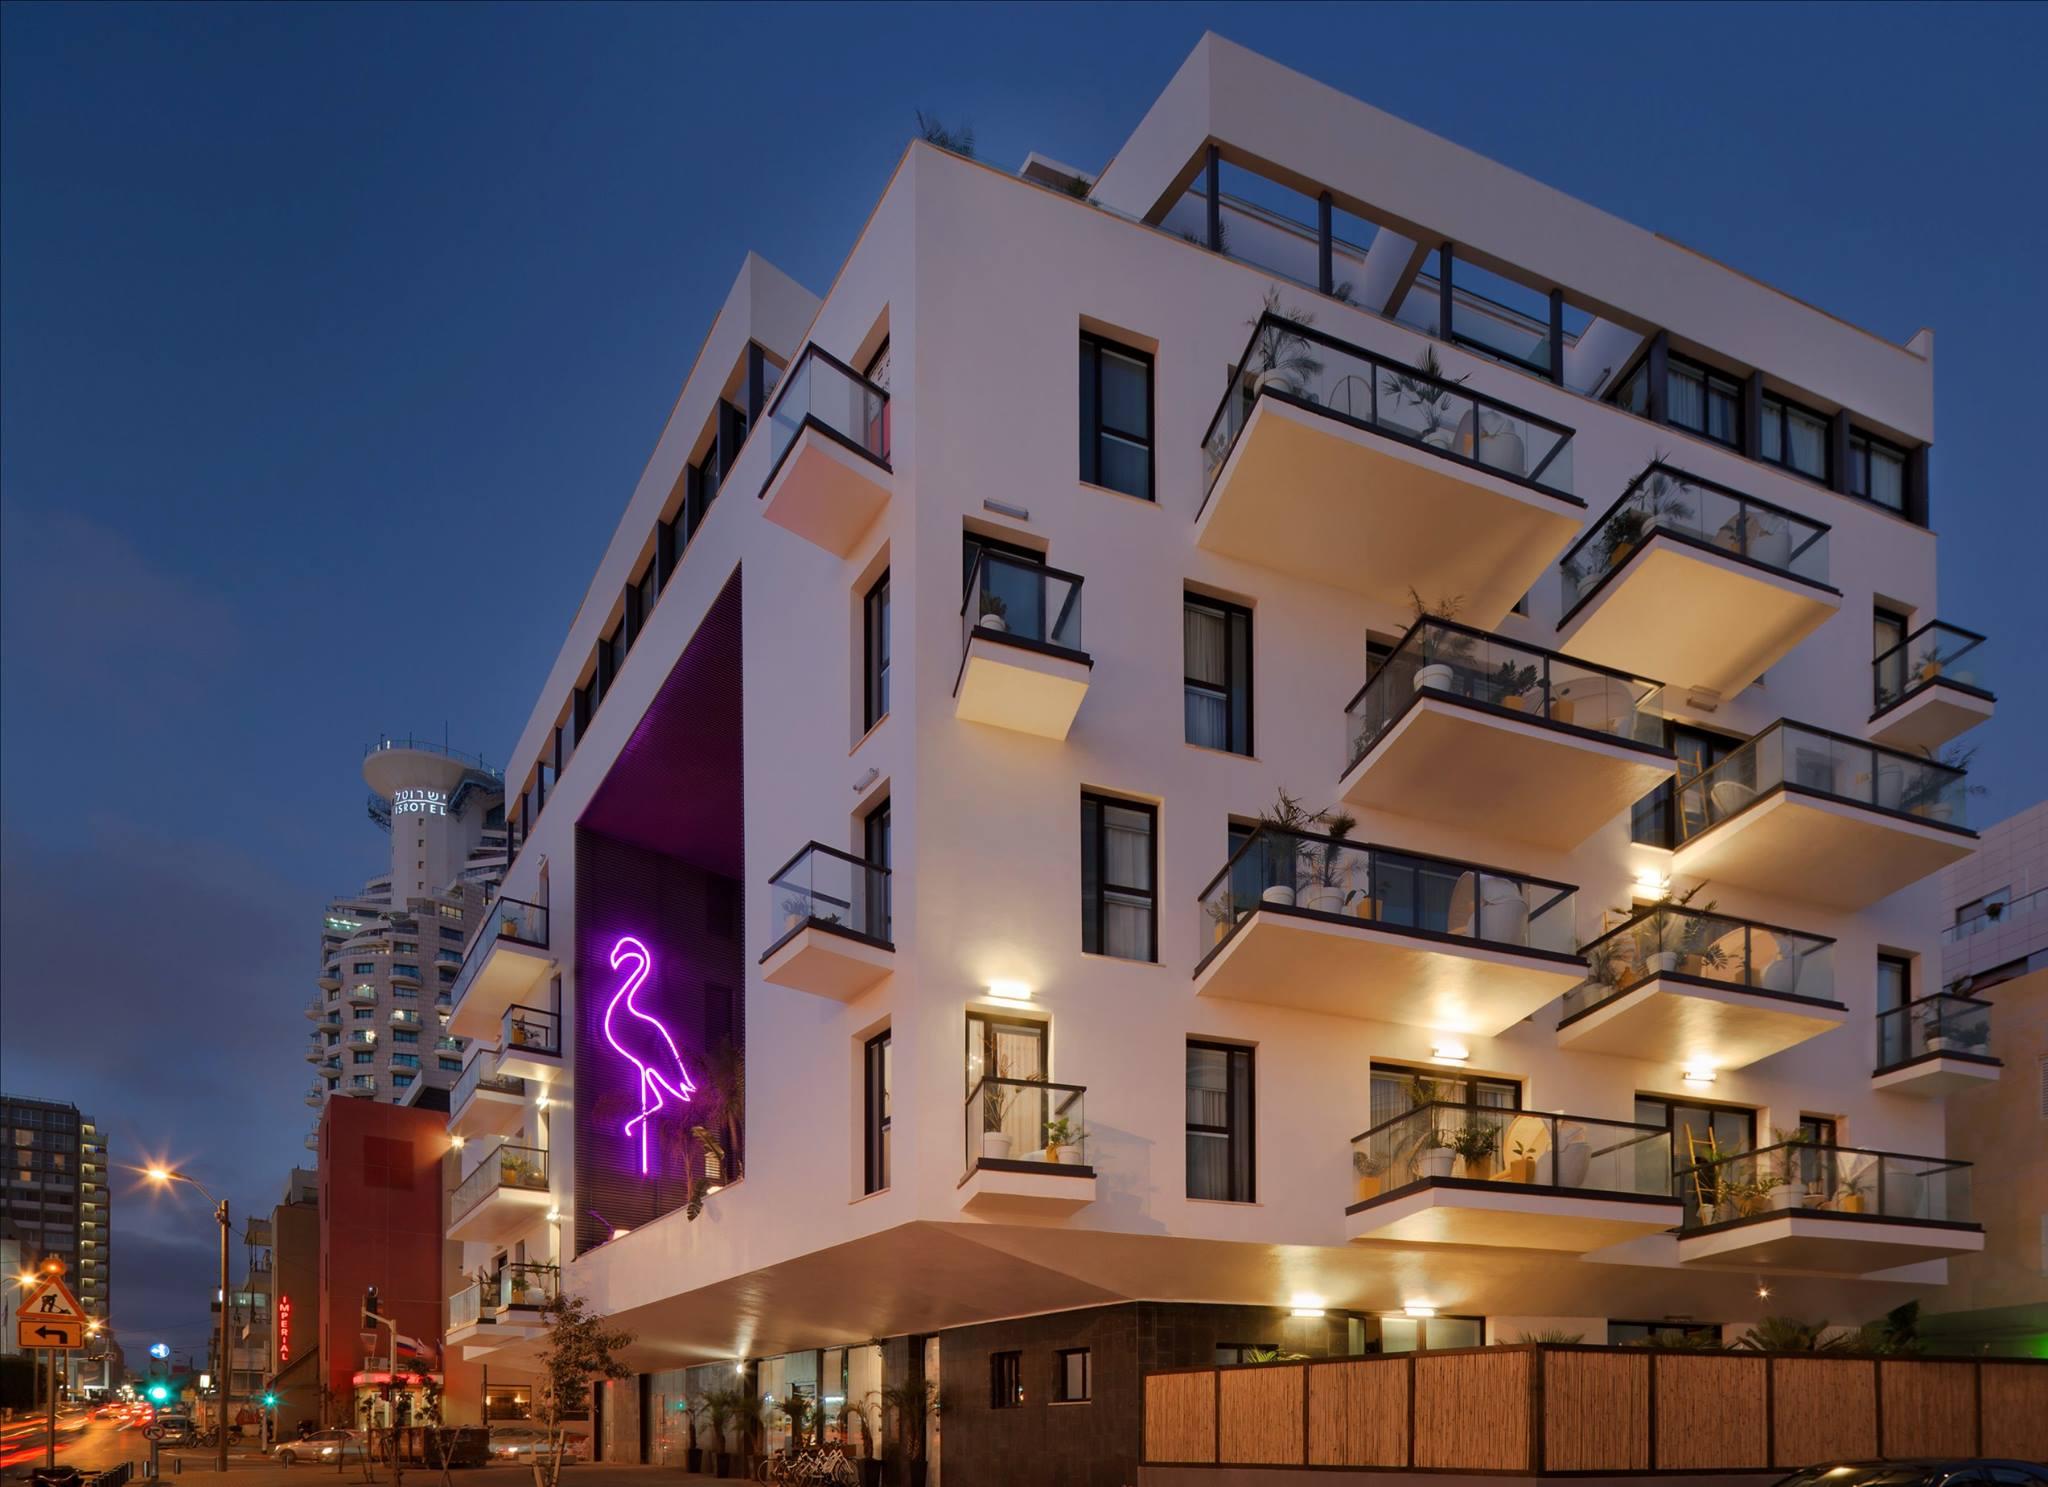 Brown Beach House - hotel in Tel Aviv